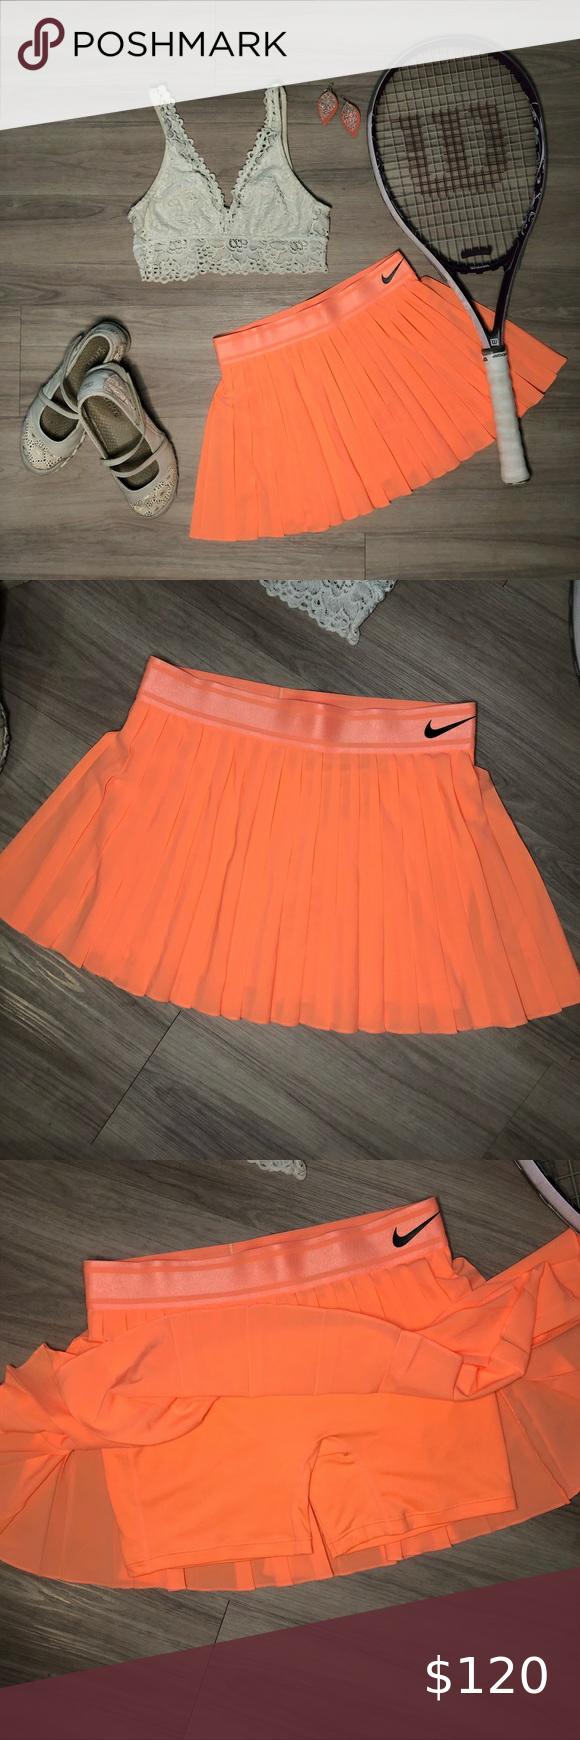 Nwt Nike Victory Pleated Tennis Skort Size Small Nike Victory Pleated Tennis Skirt W Shorts Beautiful Neon Coral Col In 2020 Pleated Tennis Skirt Womens Skirt Fashion